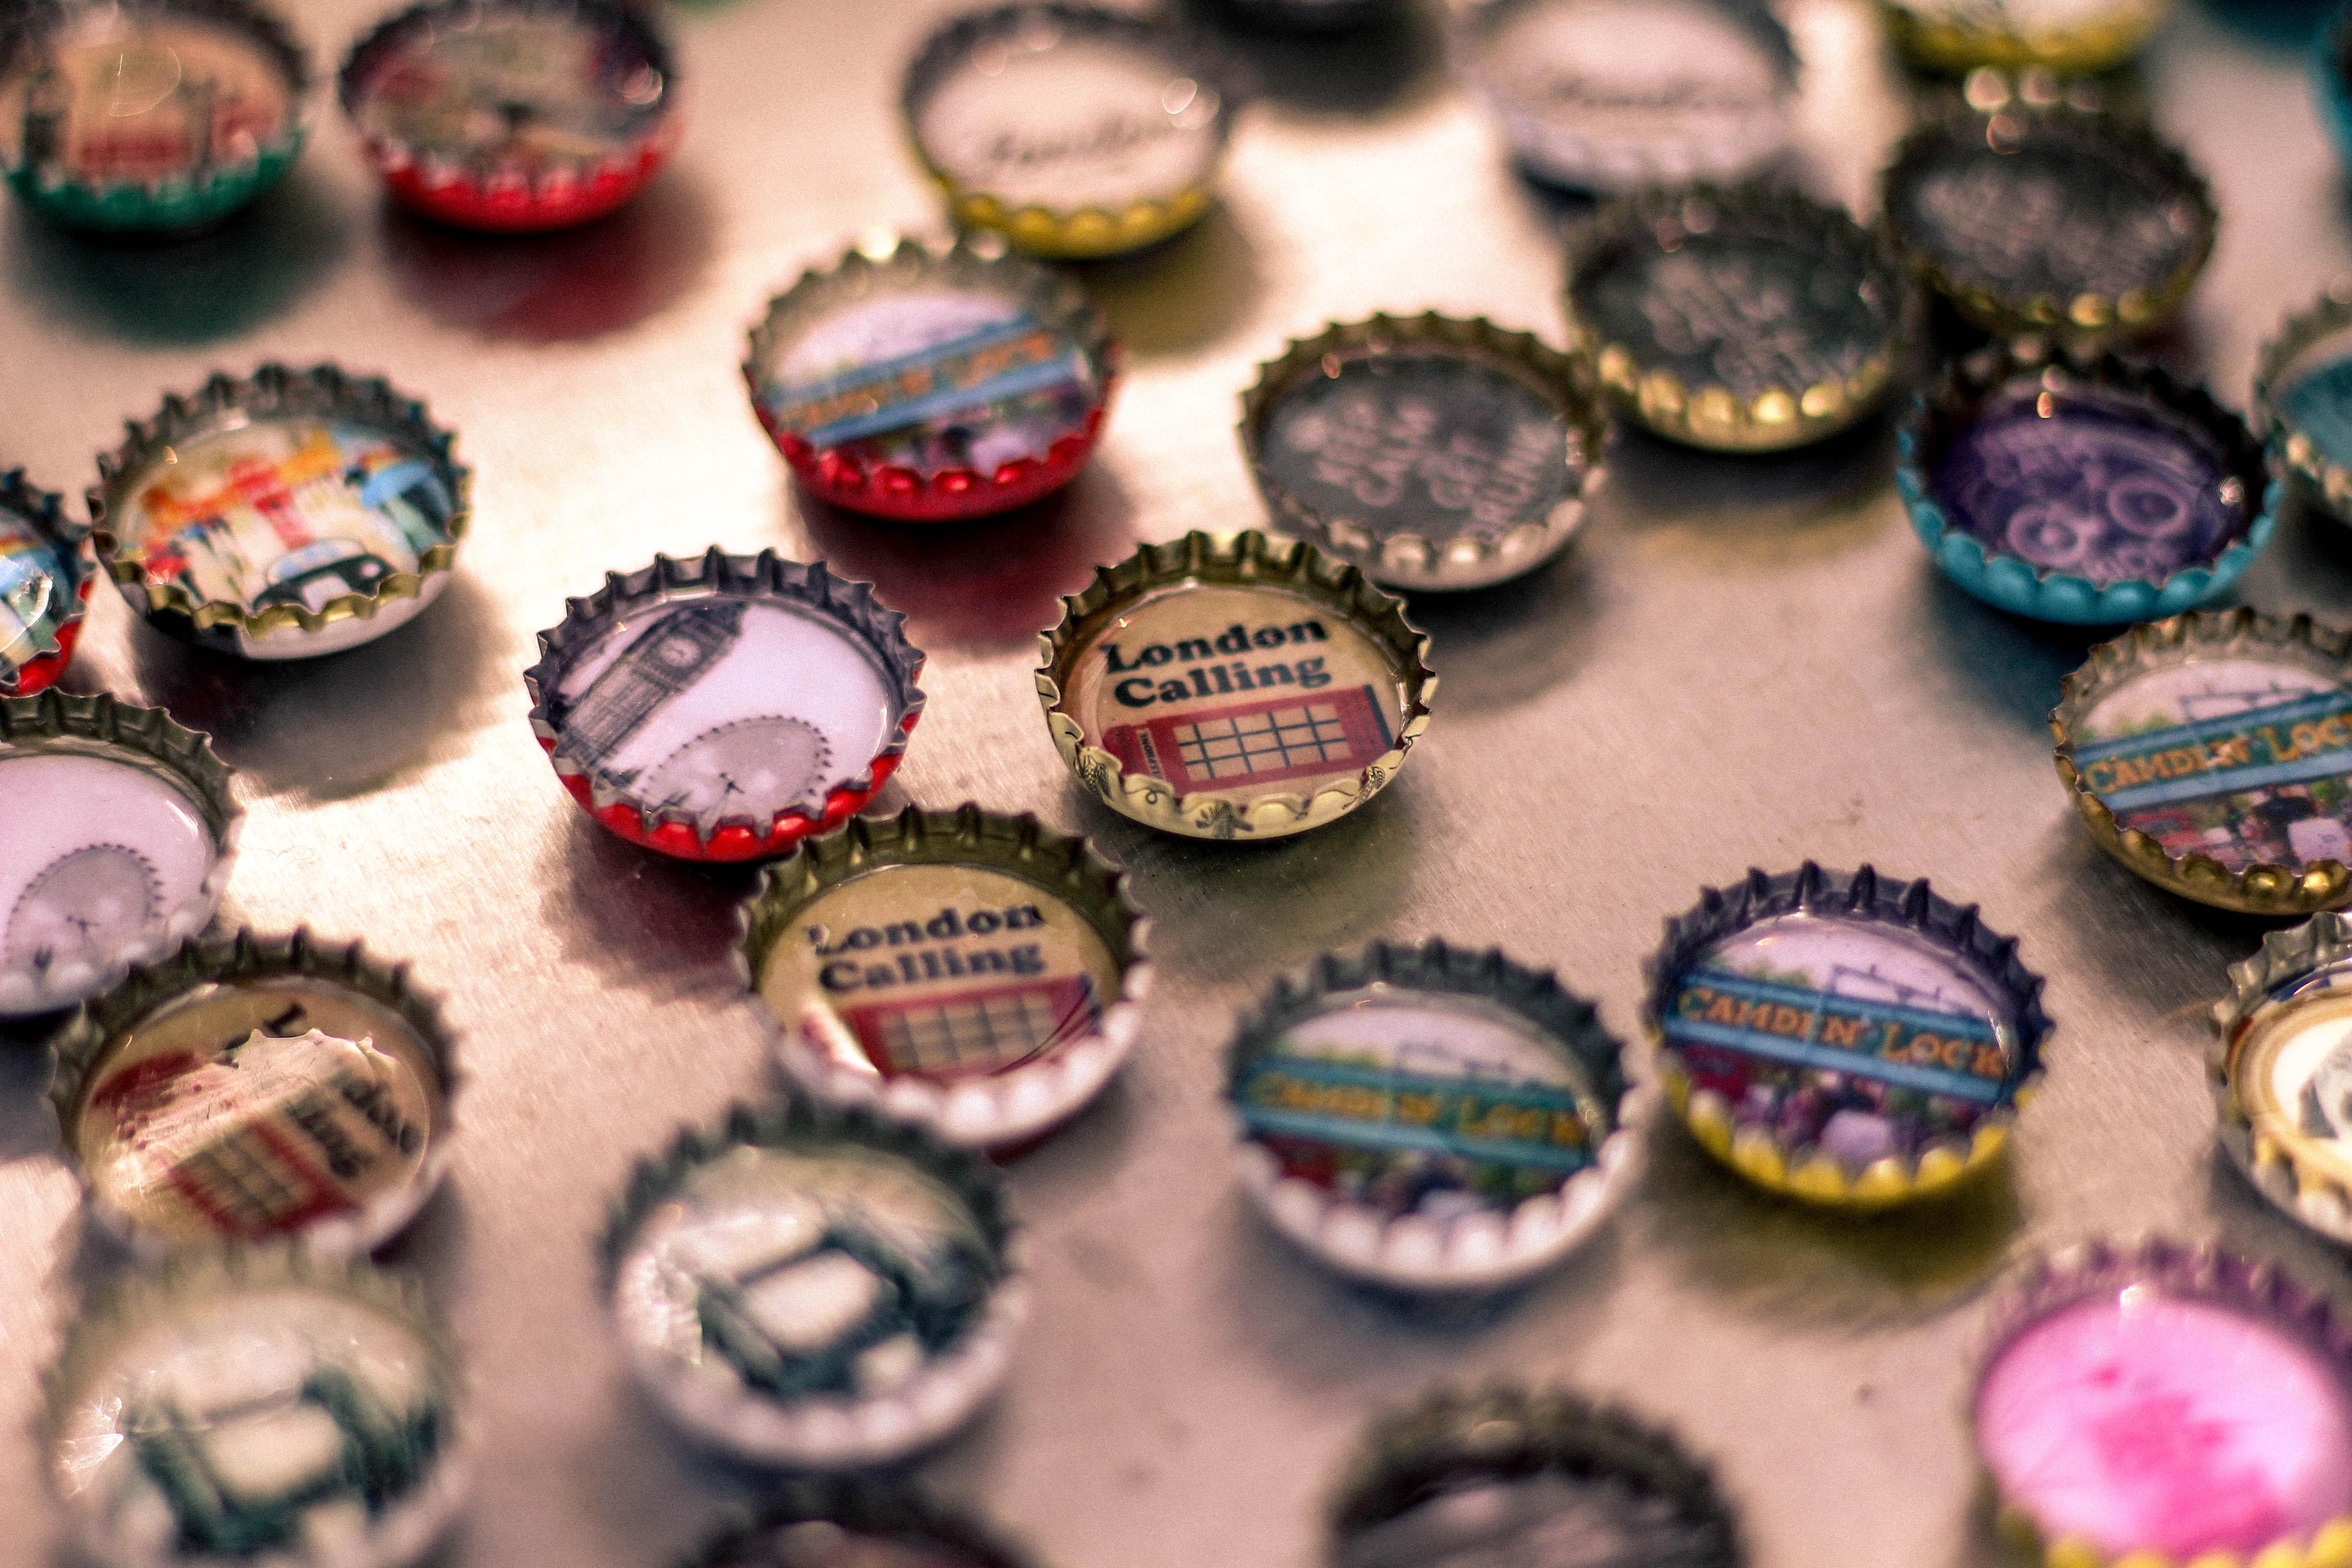 Free stock photo of bottle caps decoration design for Bottle cap designs